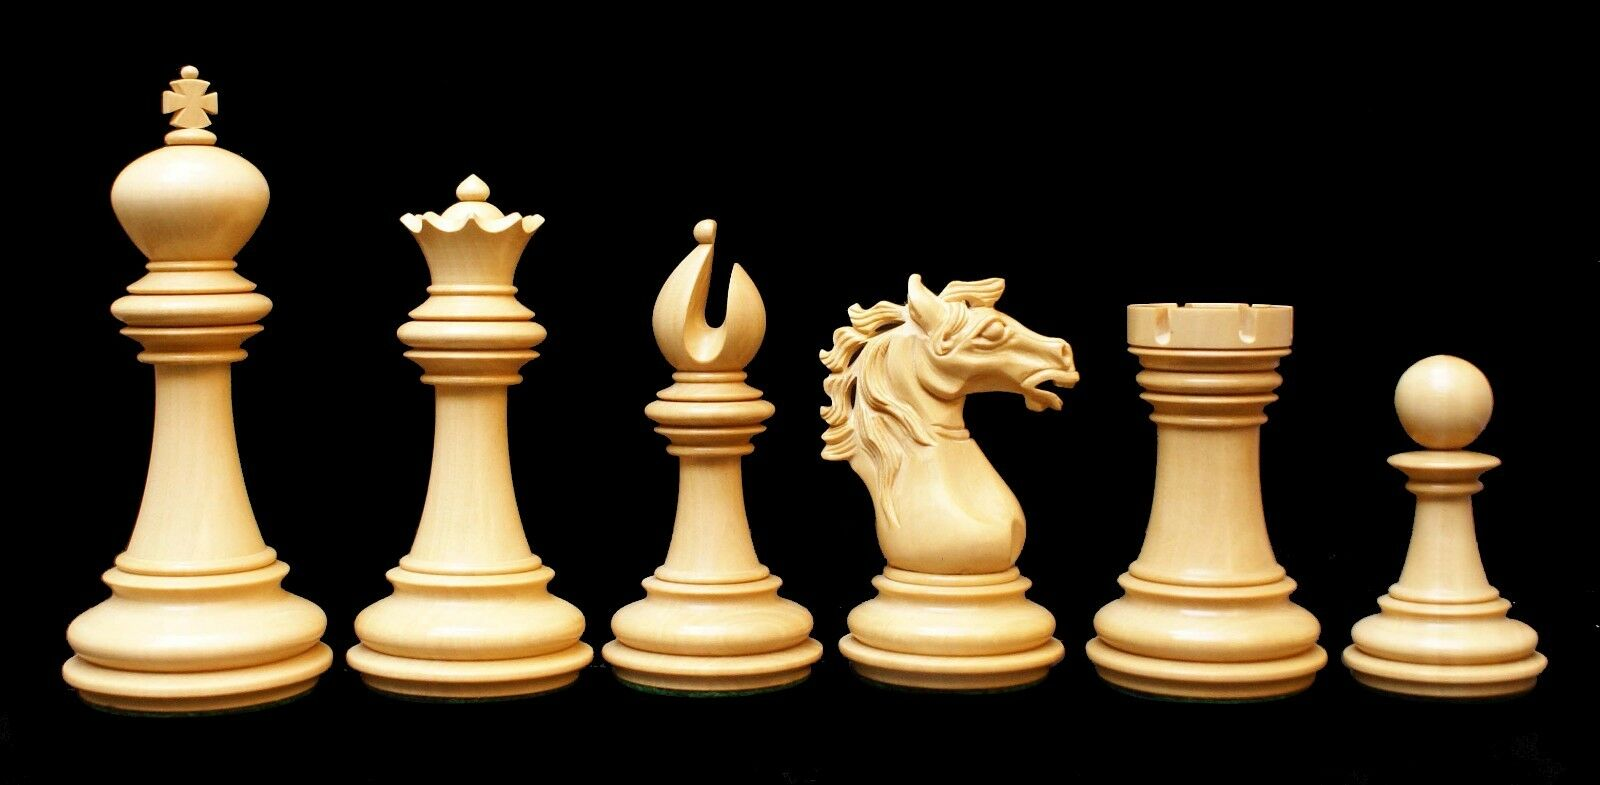 Regal Series 4  Premium Staunton Chessmen in Ebony Wood and Box Wood